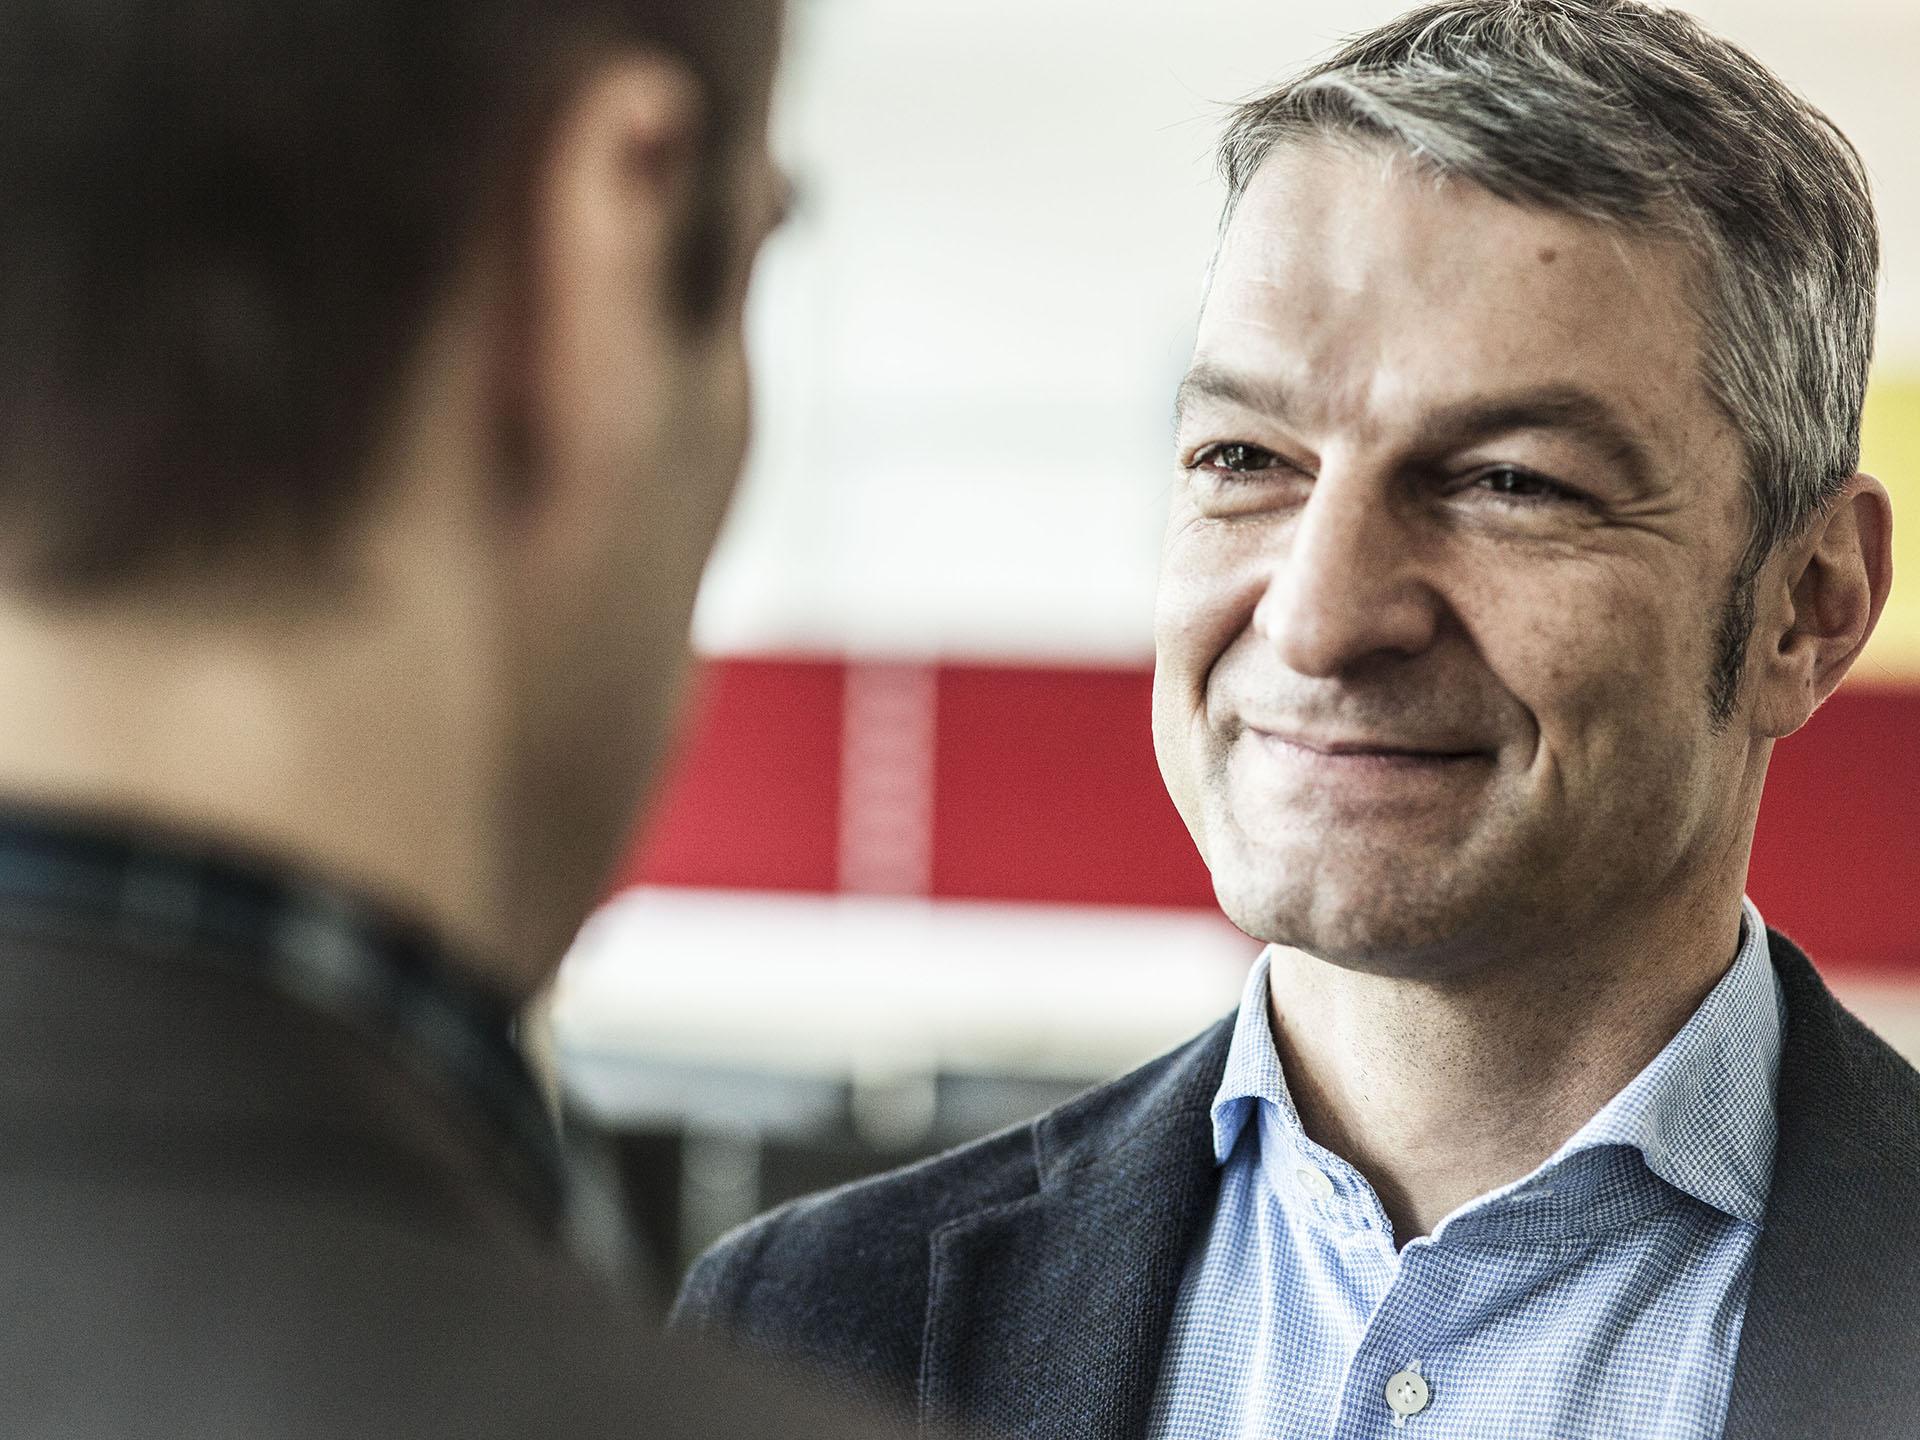 HAKOM Solutions GmbH Wien – Professional Services.